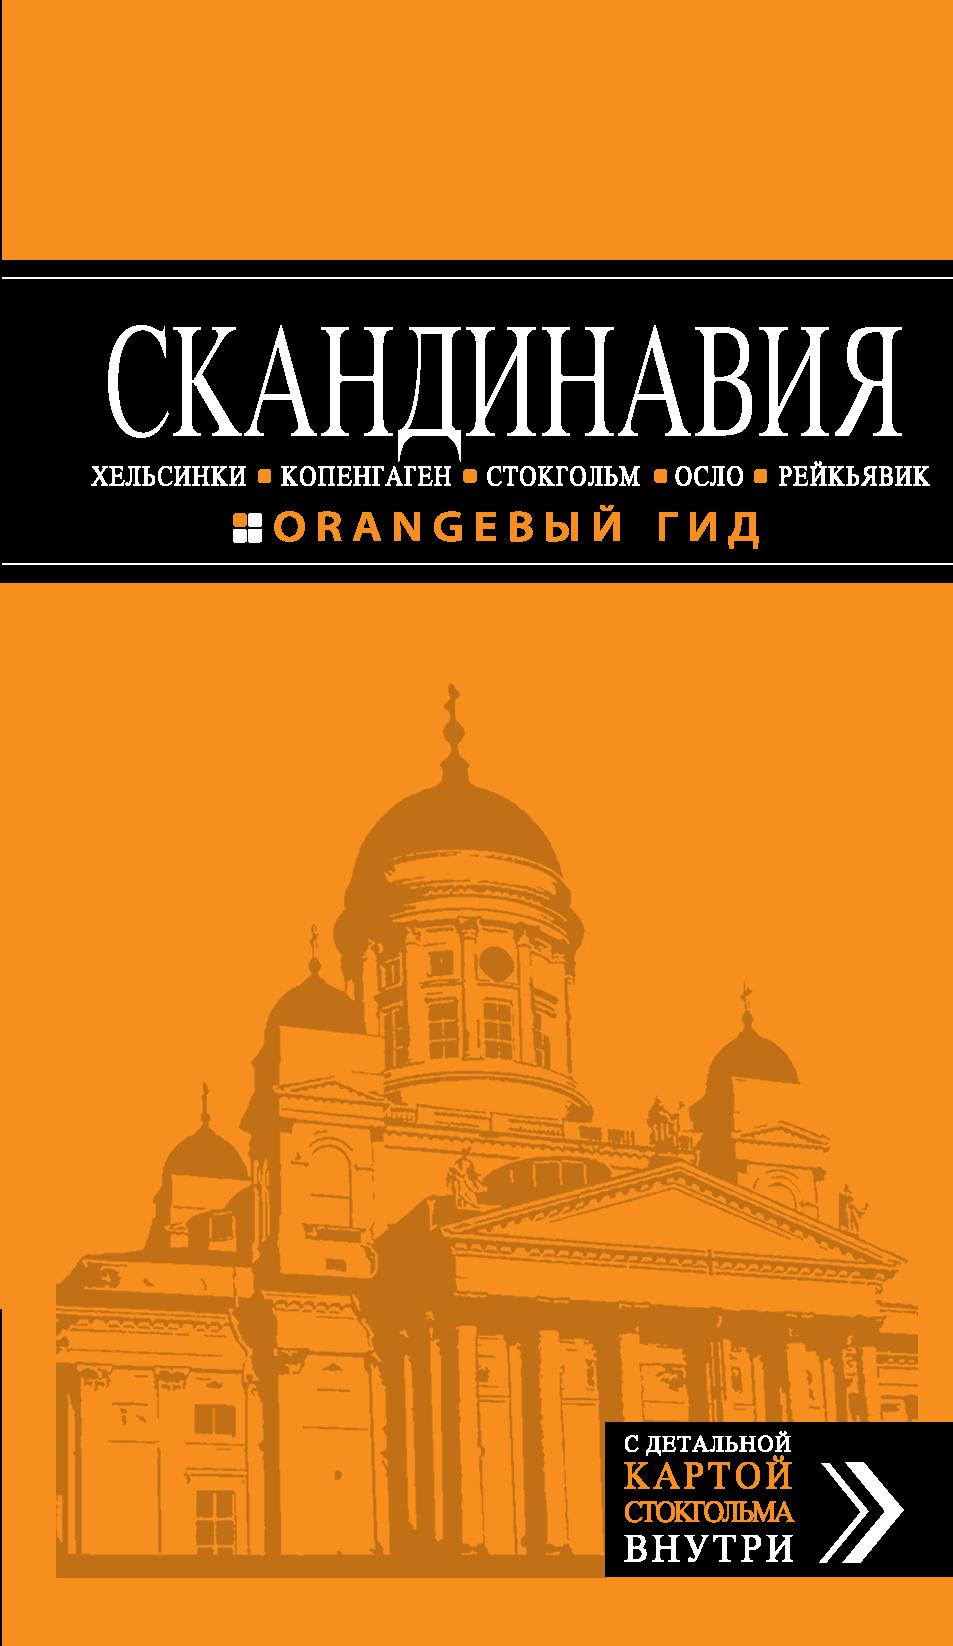 Семен Павлюк Скандинавия: Хельсинки, Копенгаген, Стокгольм, Осло, Рейкьявик. Путеводитель хельсинки путеводитель